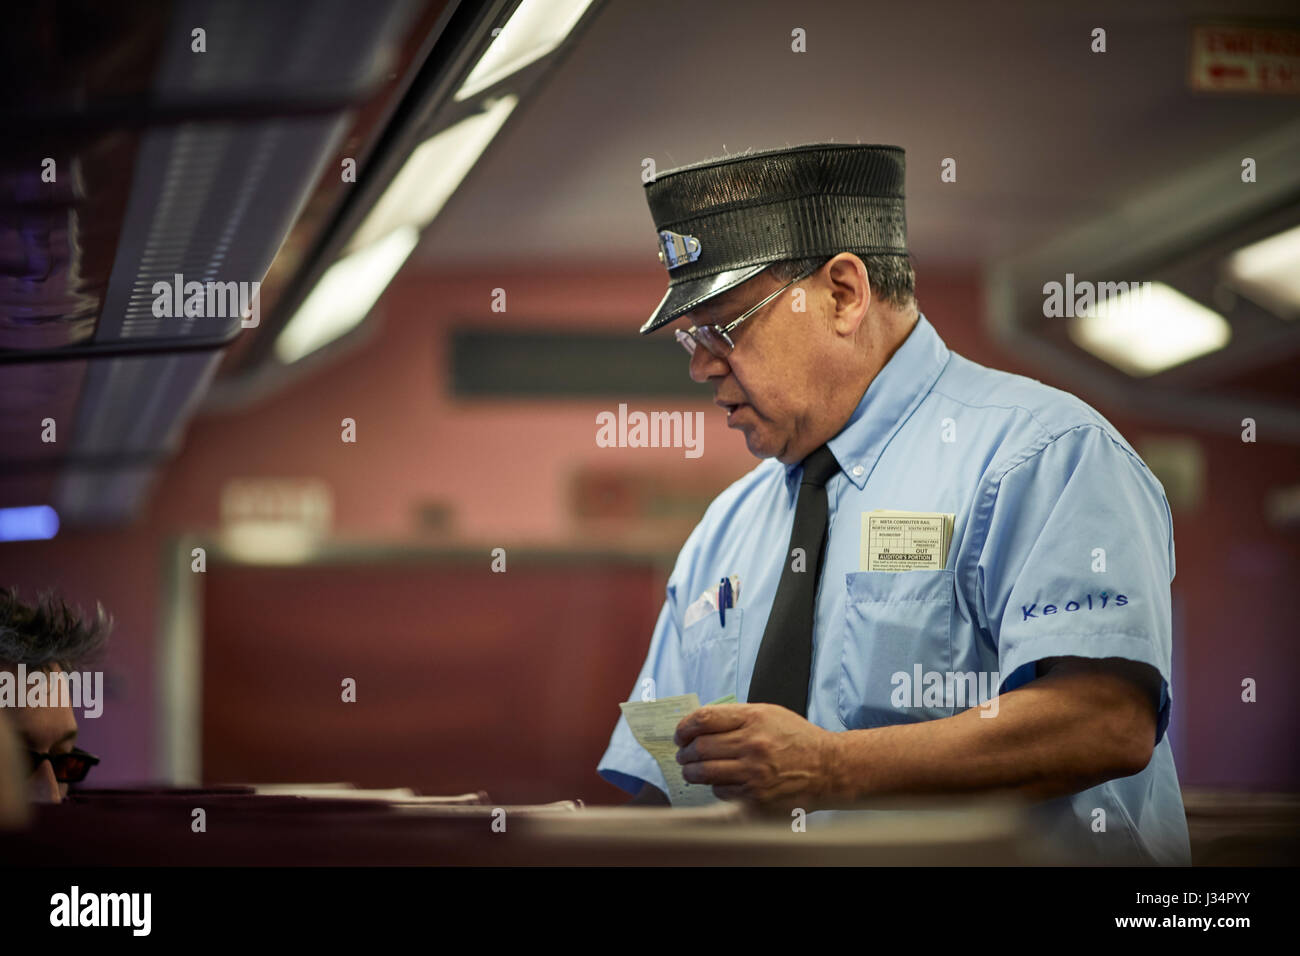 Massachusetts Bay Transportation Authority guard inspecting tickets on a train to Boston, Massachusetts, United - Stock Image